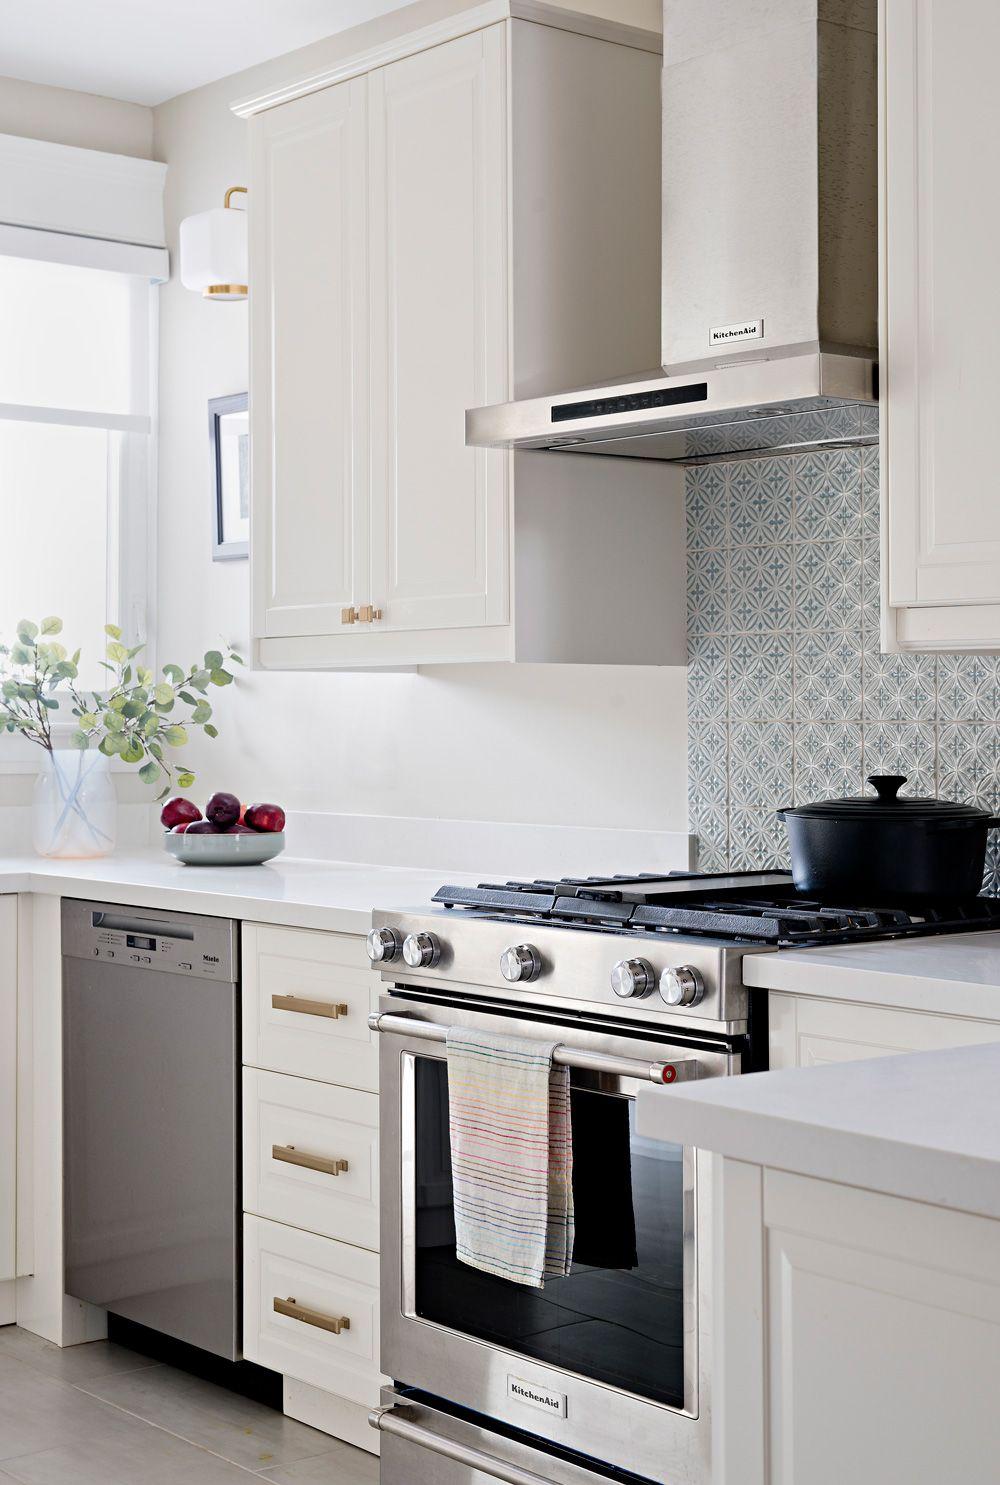 Stainless Steel Kitchenaid Appliances In Stunning White Ikea